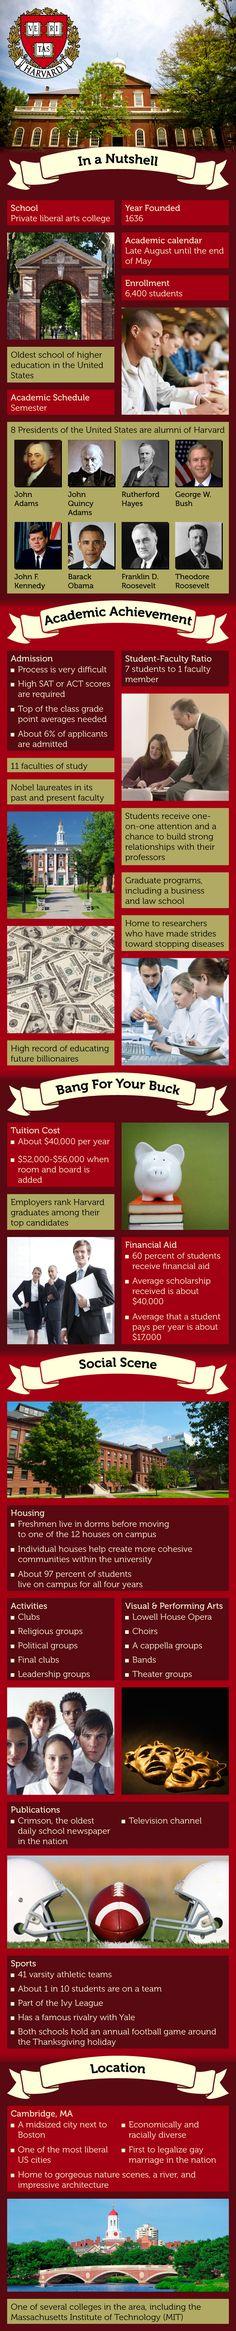 Harvard University Infographichttp://www.mapsofworld.com/pages/usa-universities/infographics/harvard-university-infographic/